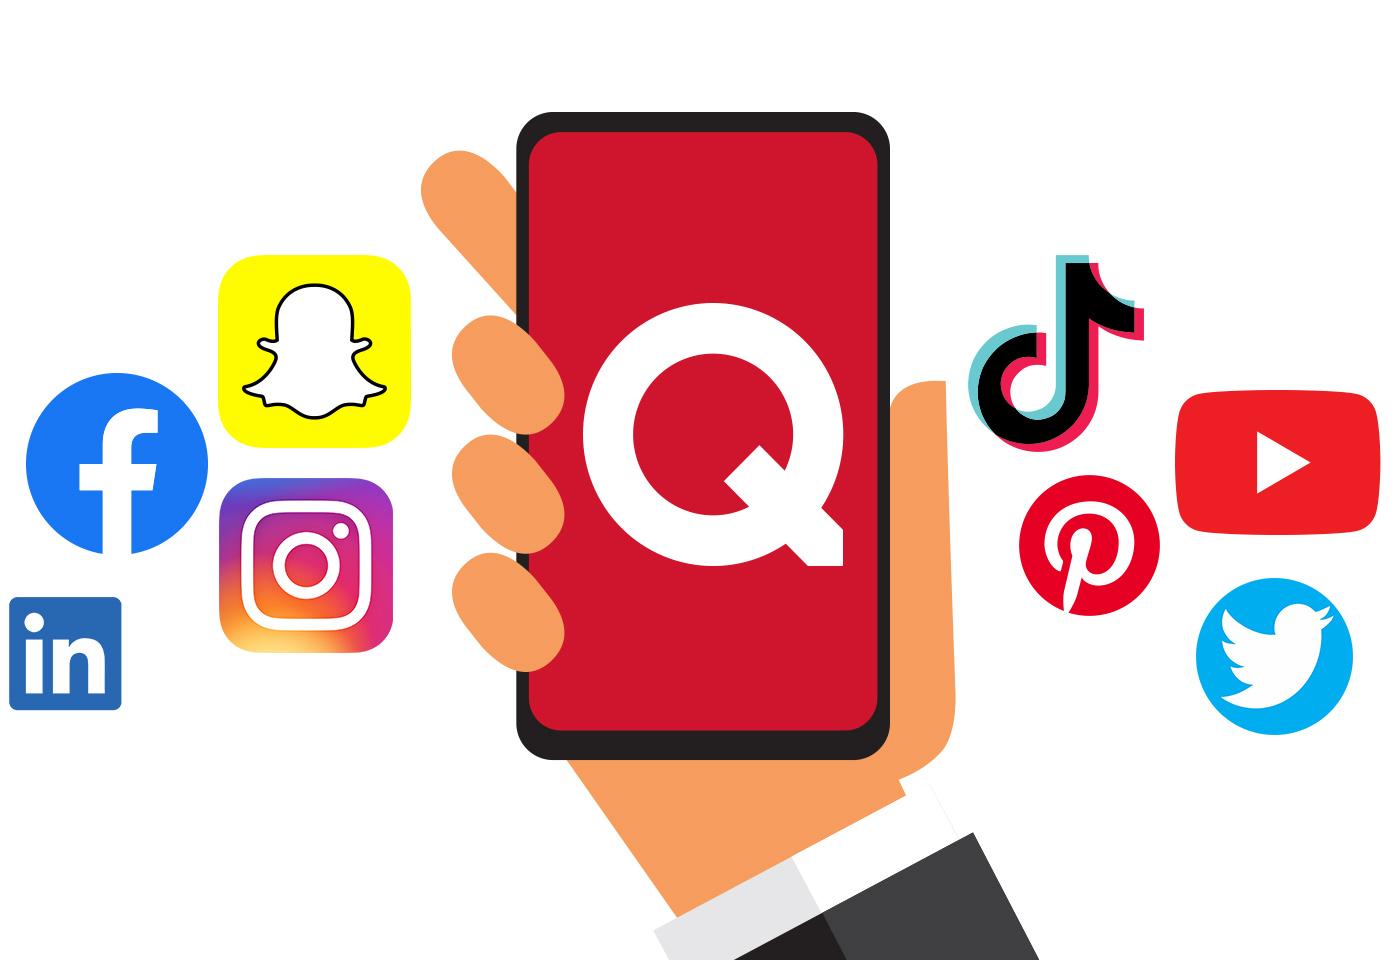 Social media accounts. Facebook, Snapchat, Instagram, Linkedin, TikTok, Pinterest, Youtube, Twitter. The Quell Group